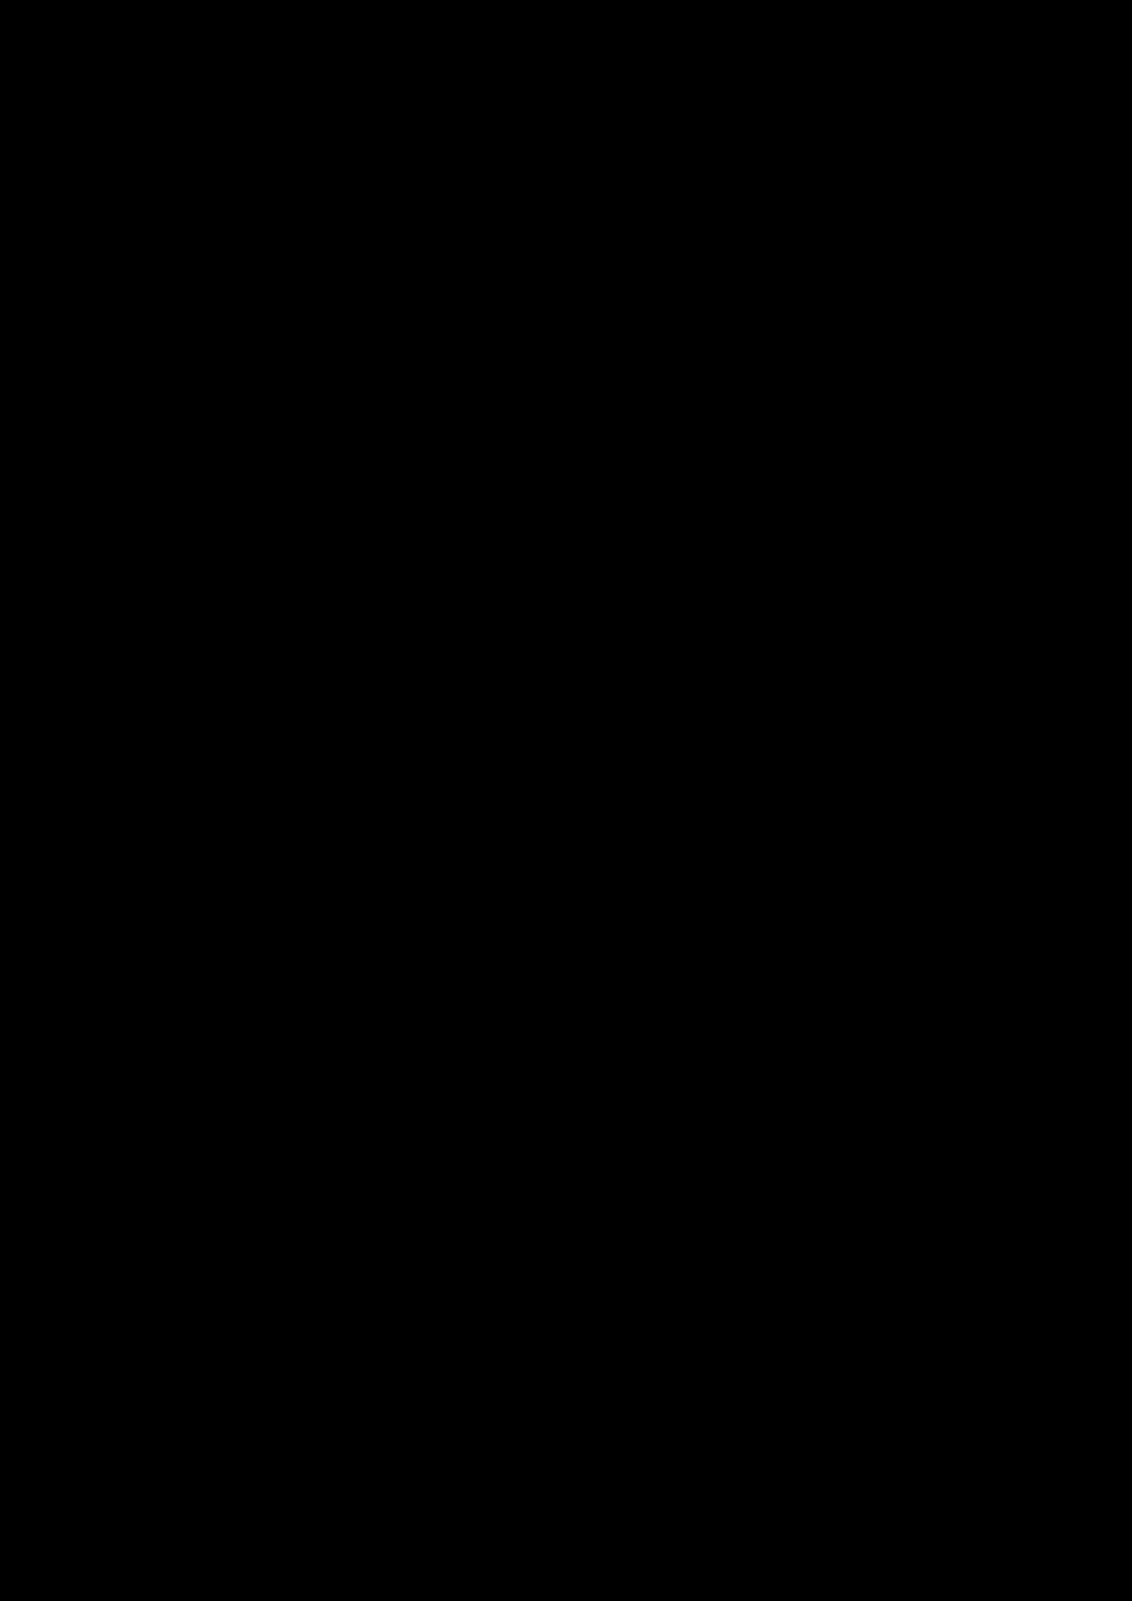 18 berez slide, Image 15